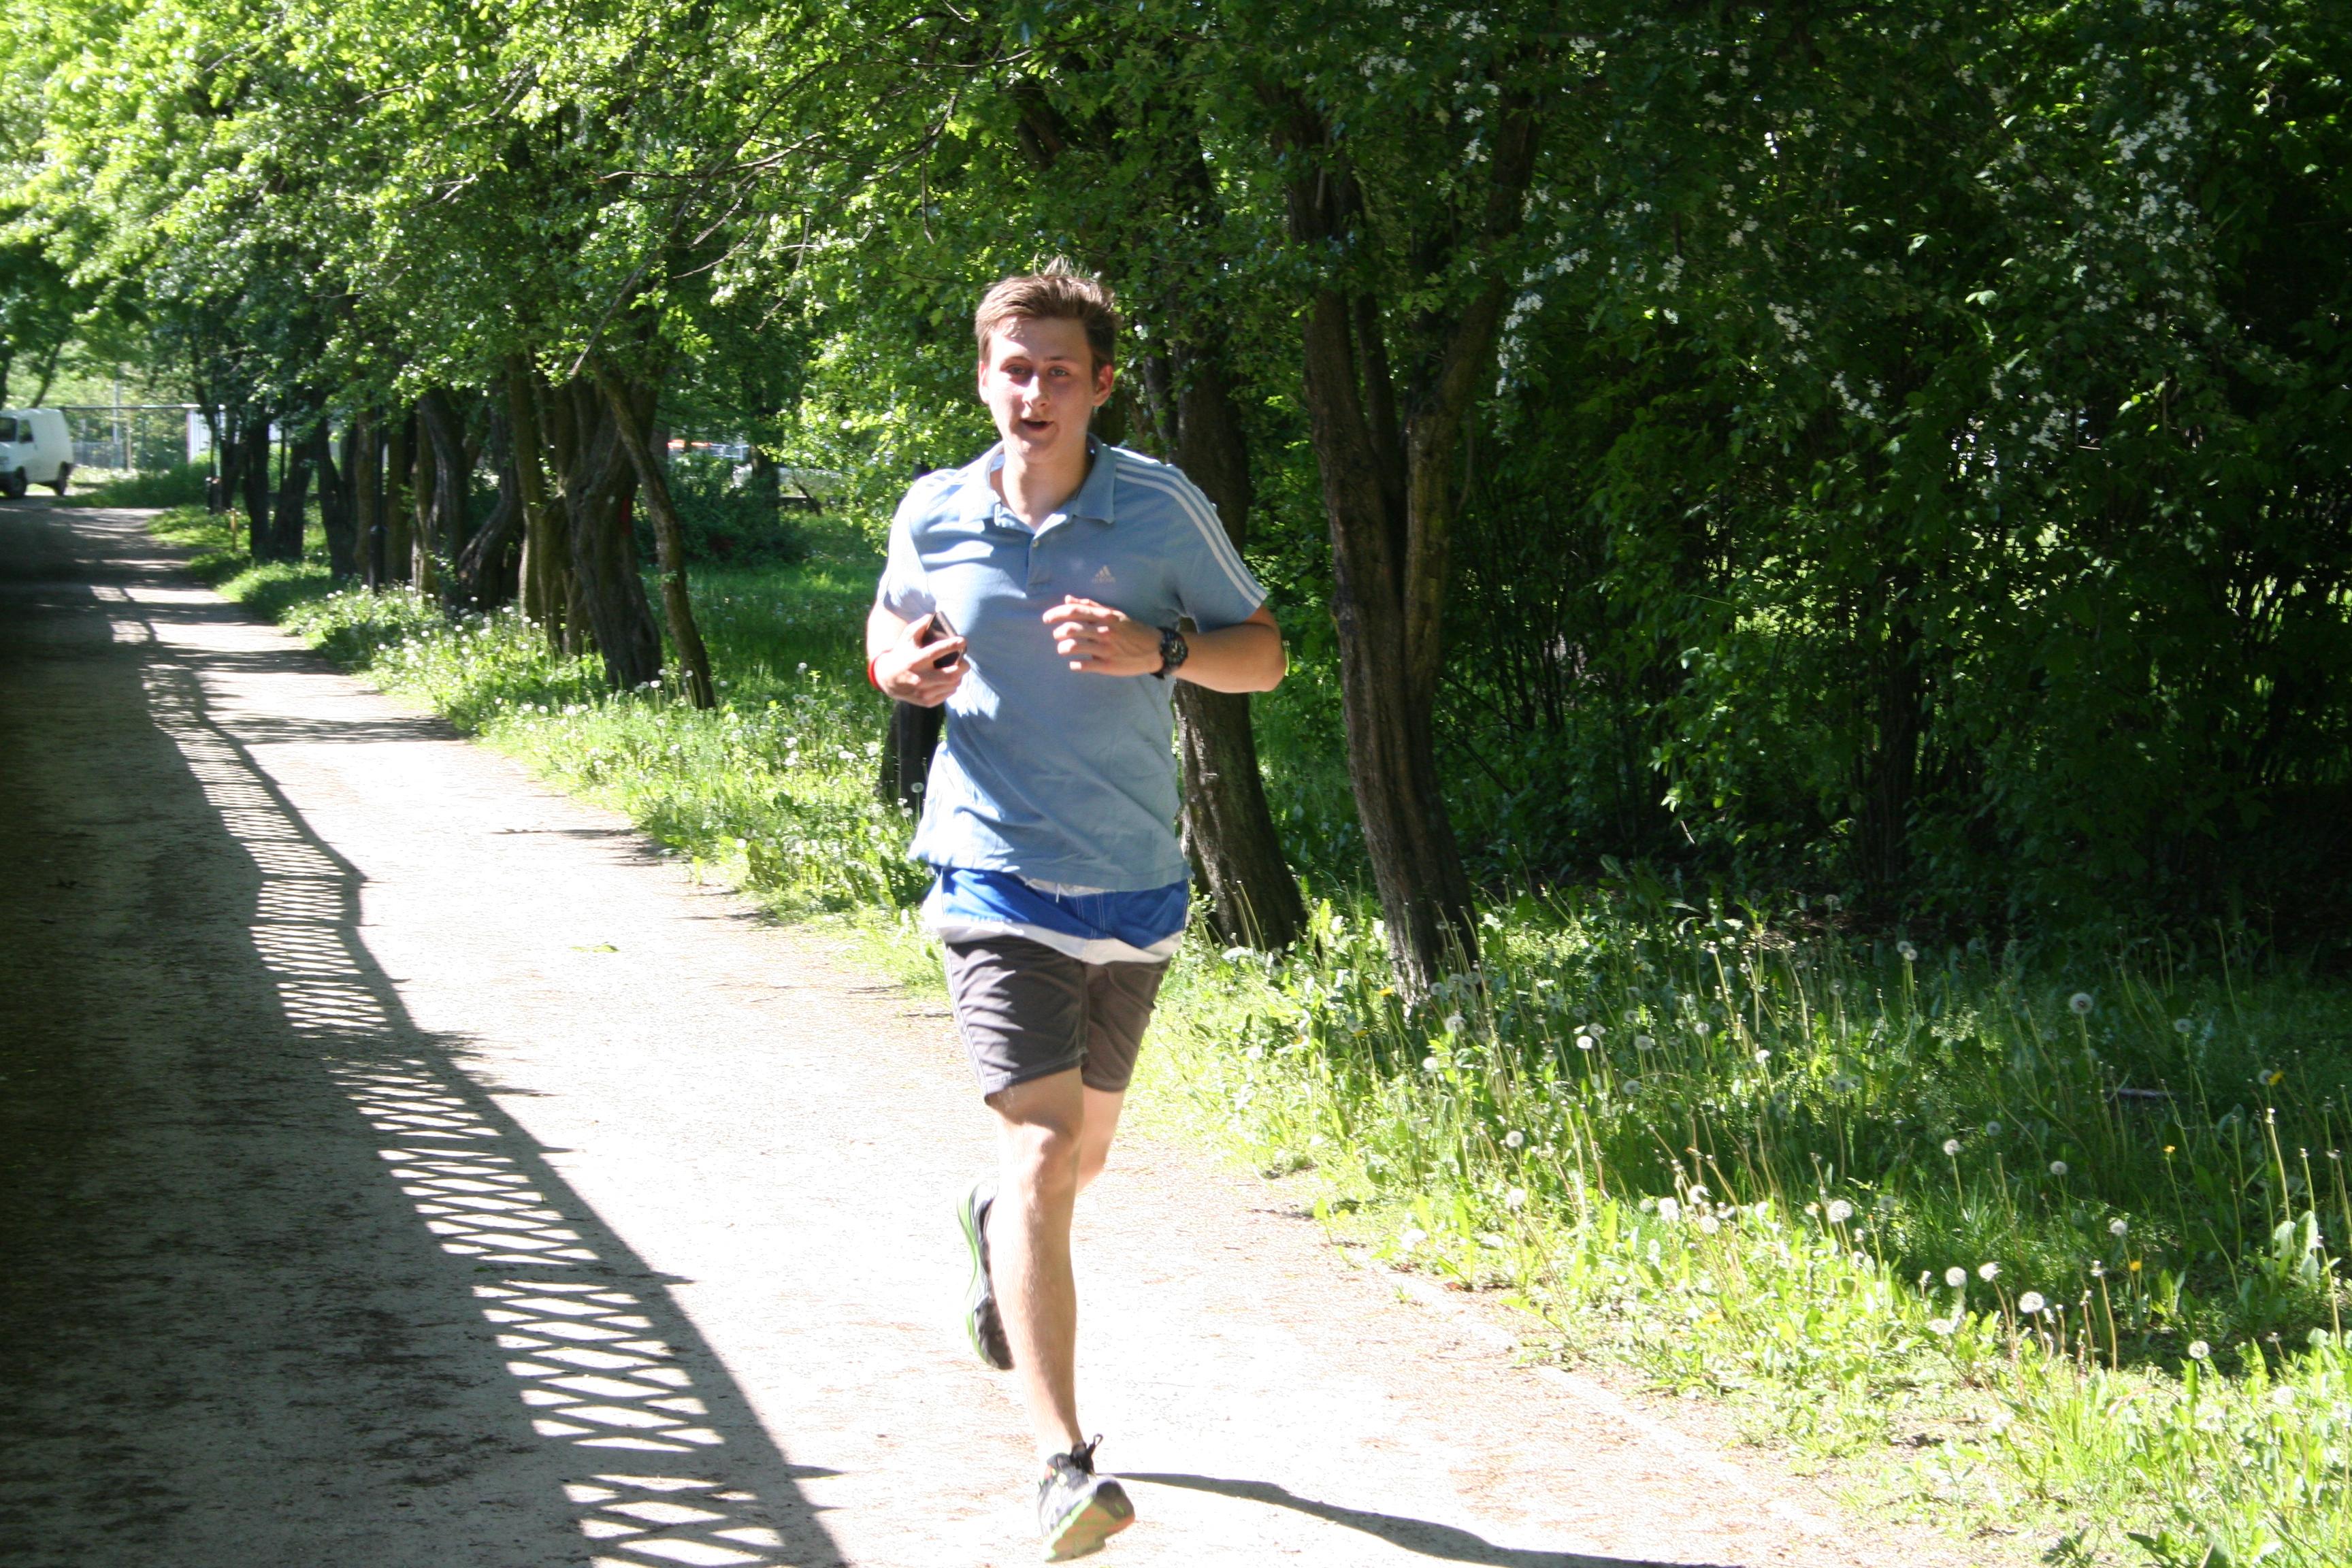 Trening przed maratonem